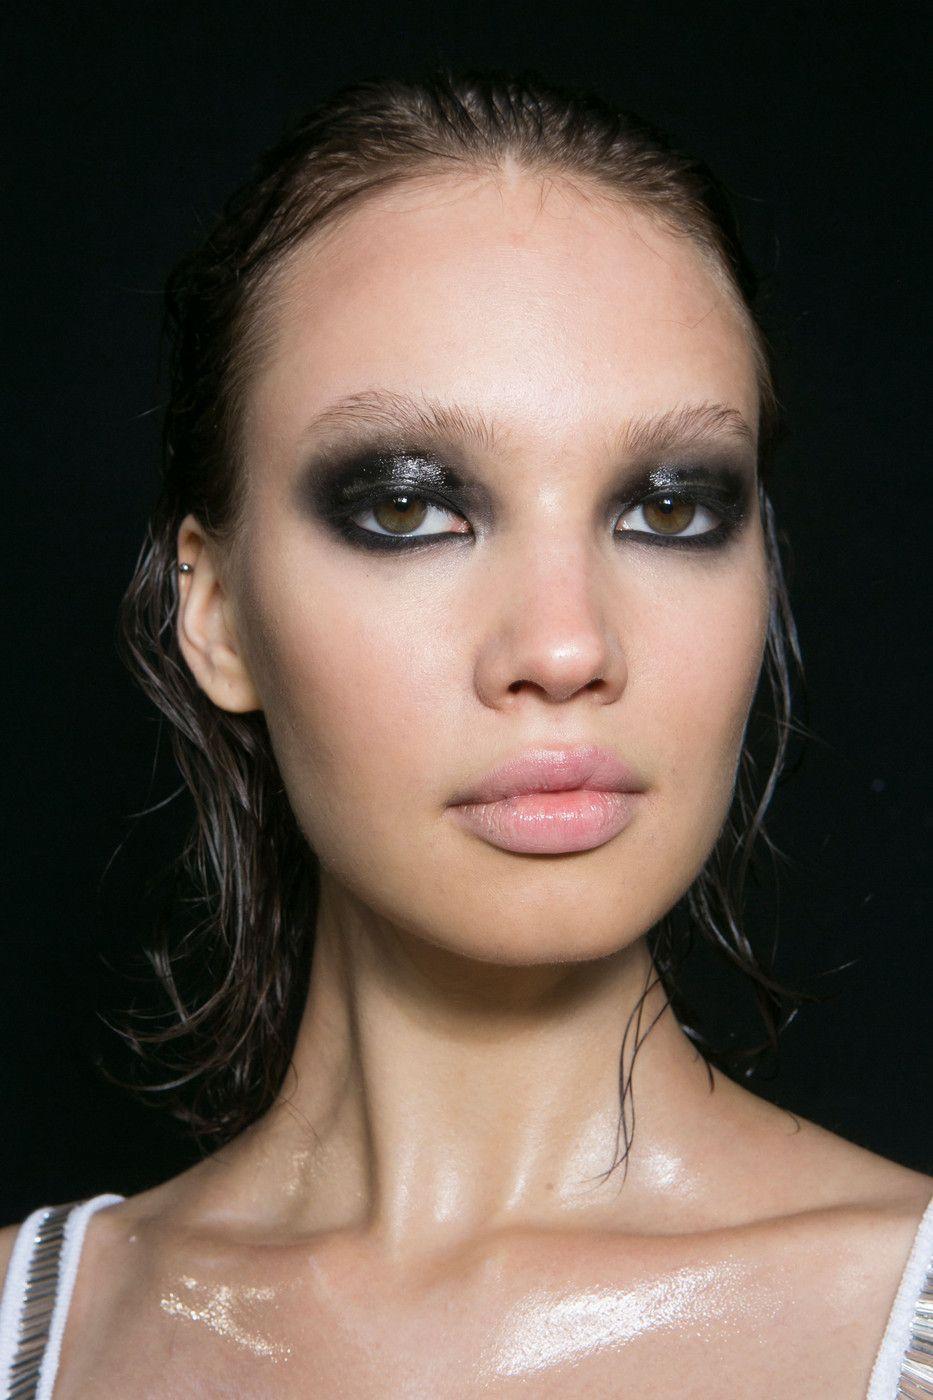 Dark Reign with model Puck Loomans (Elle Vietnam